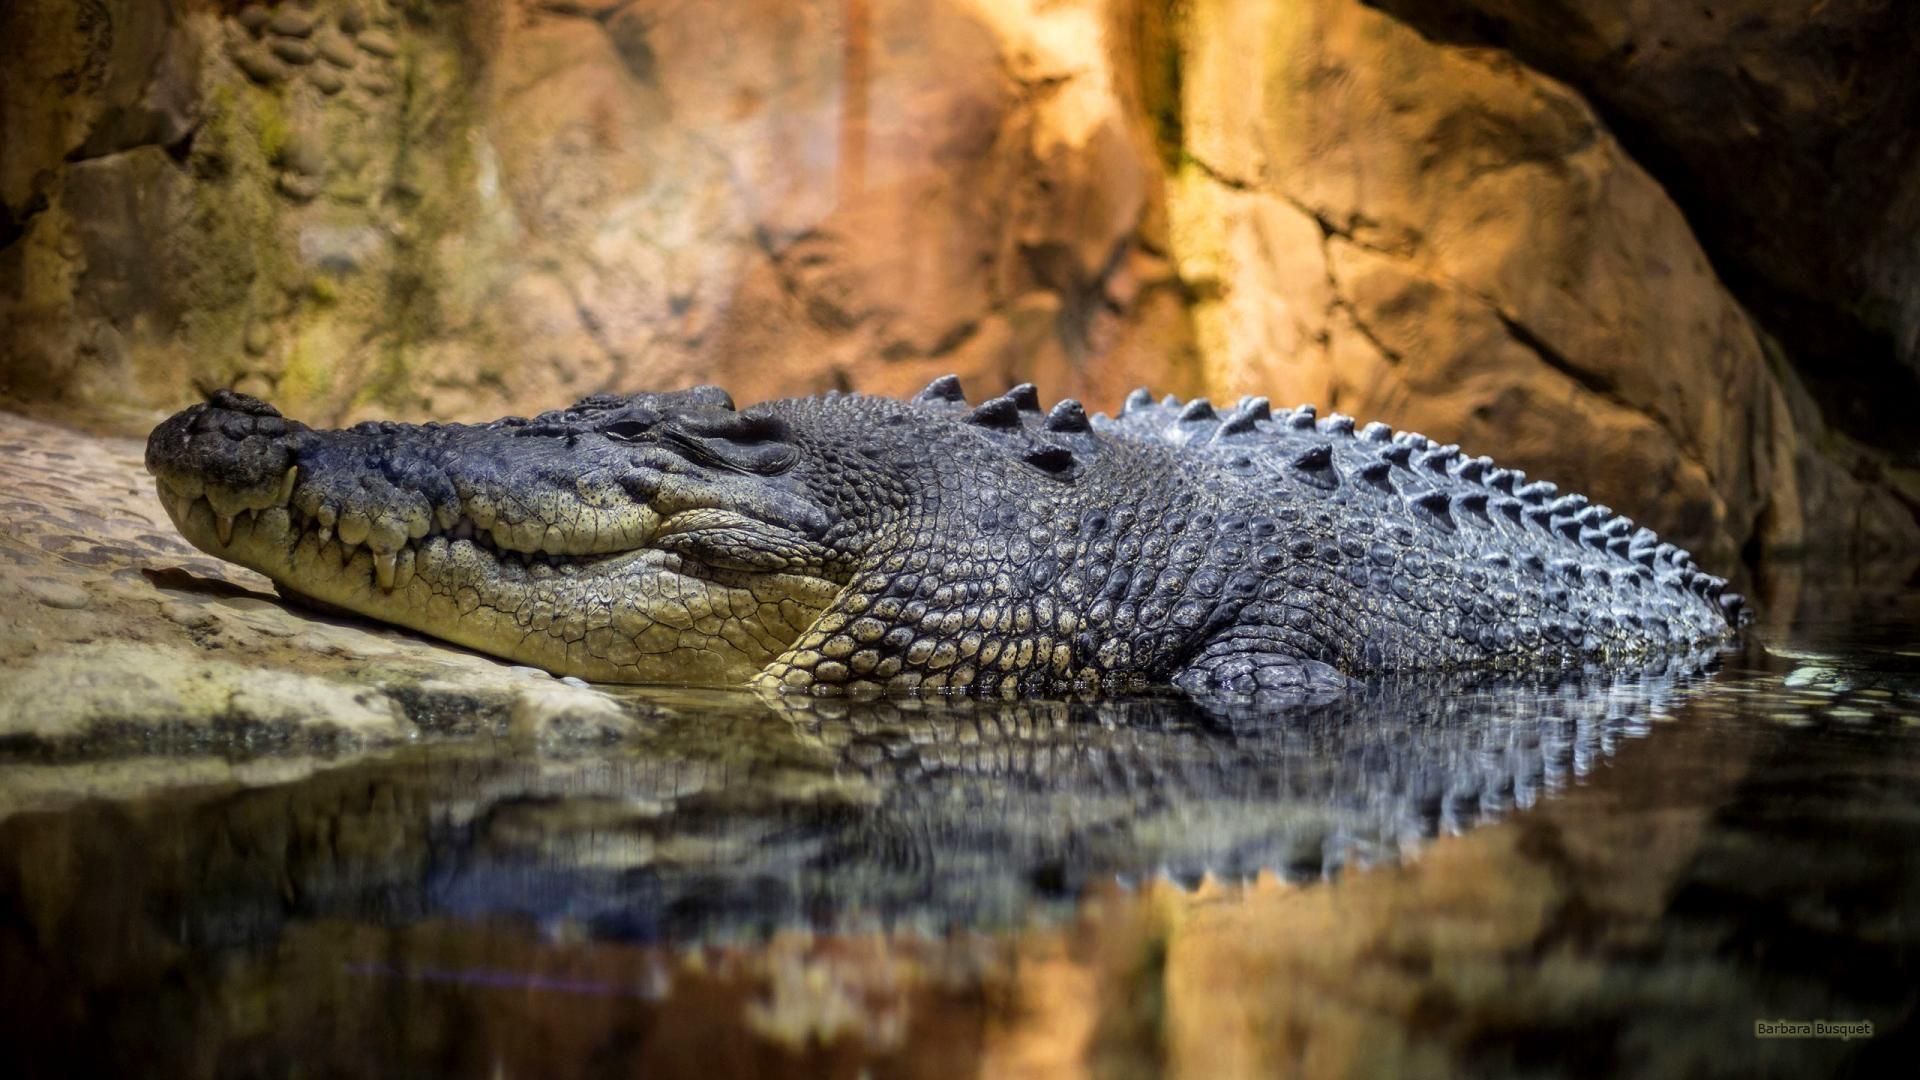 Crocodile Cool Wallpaper